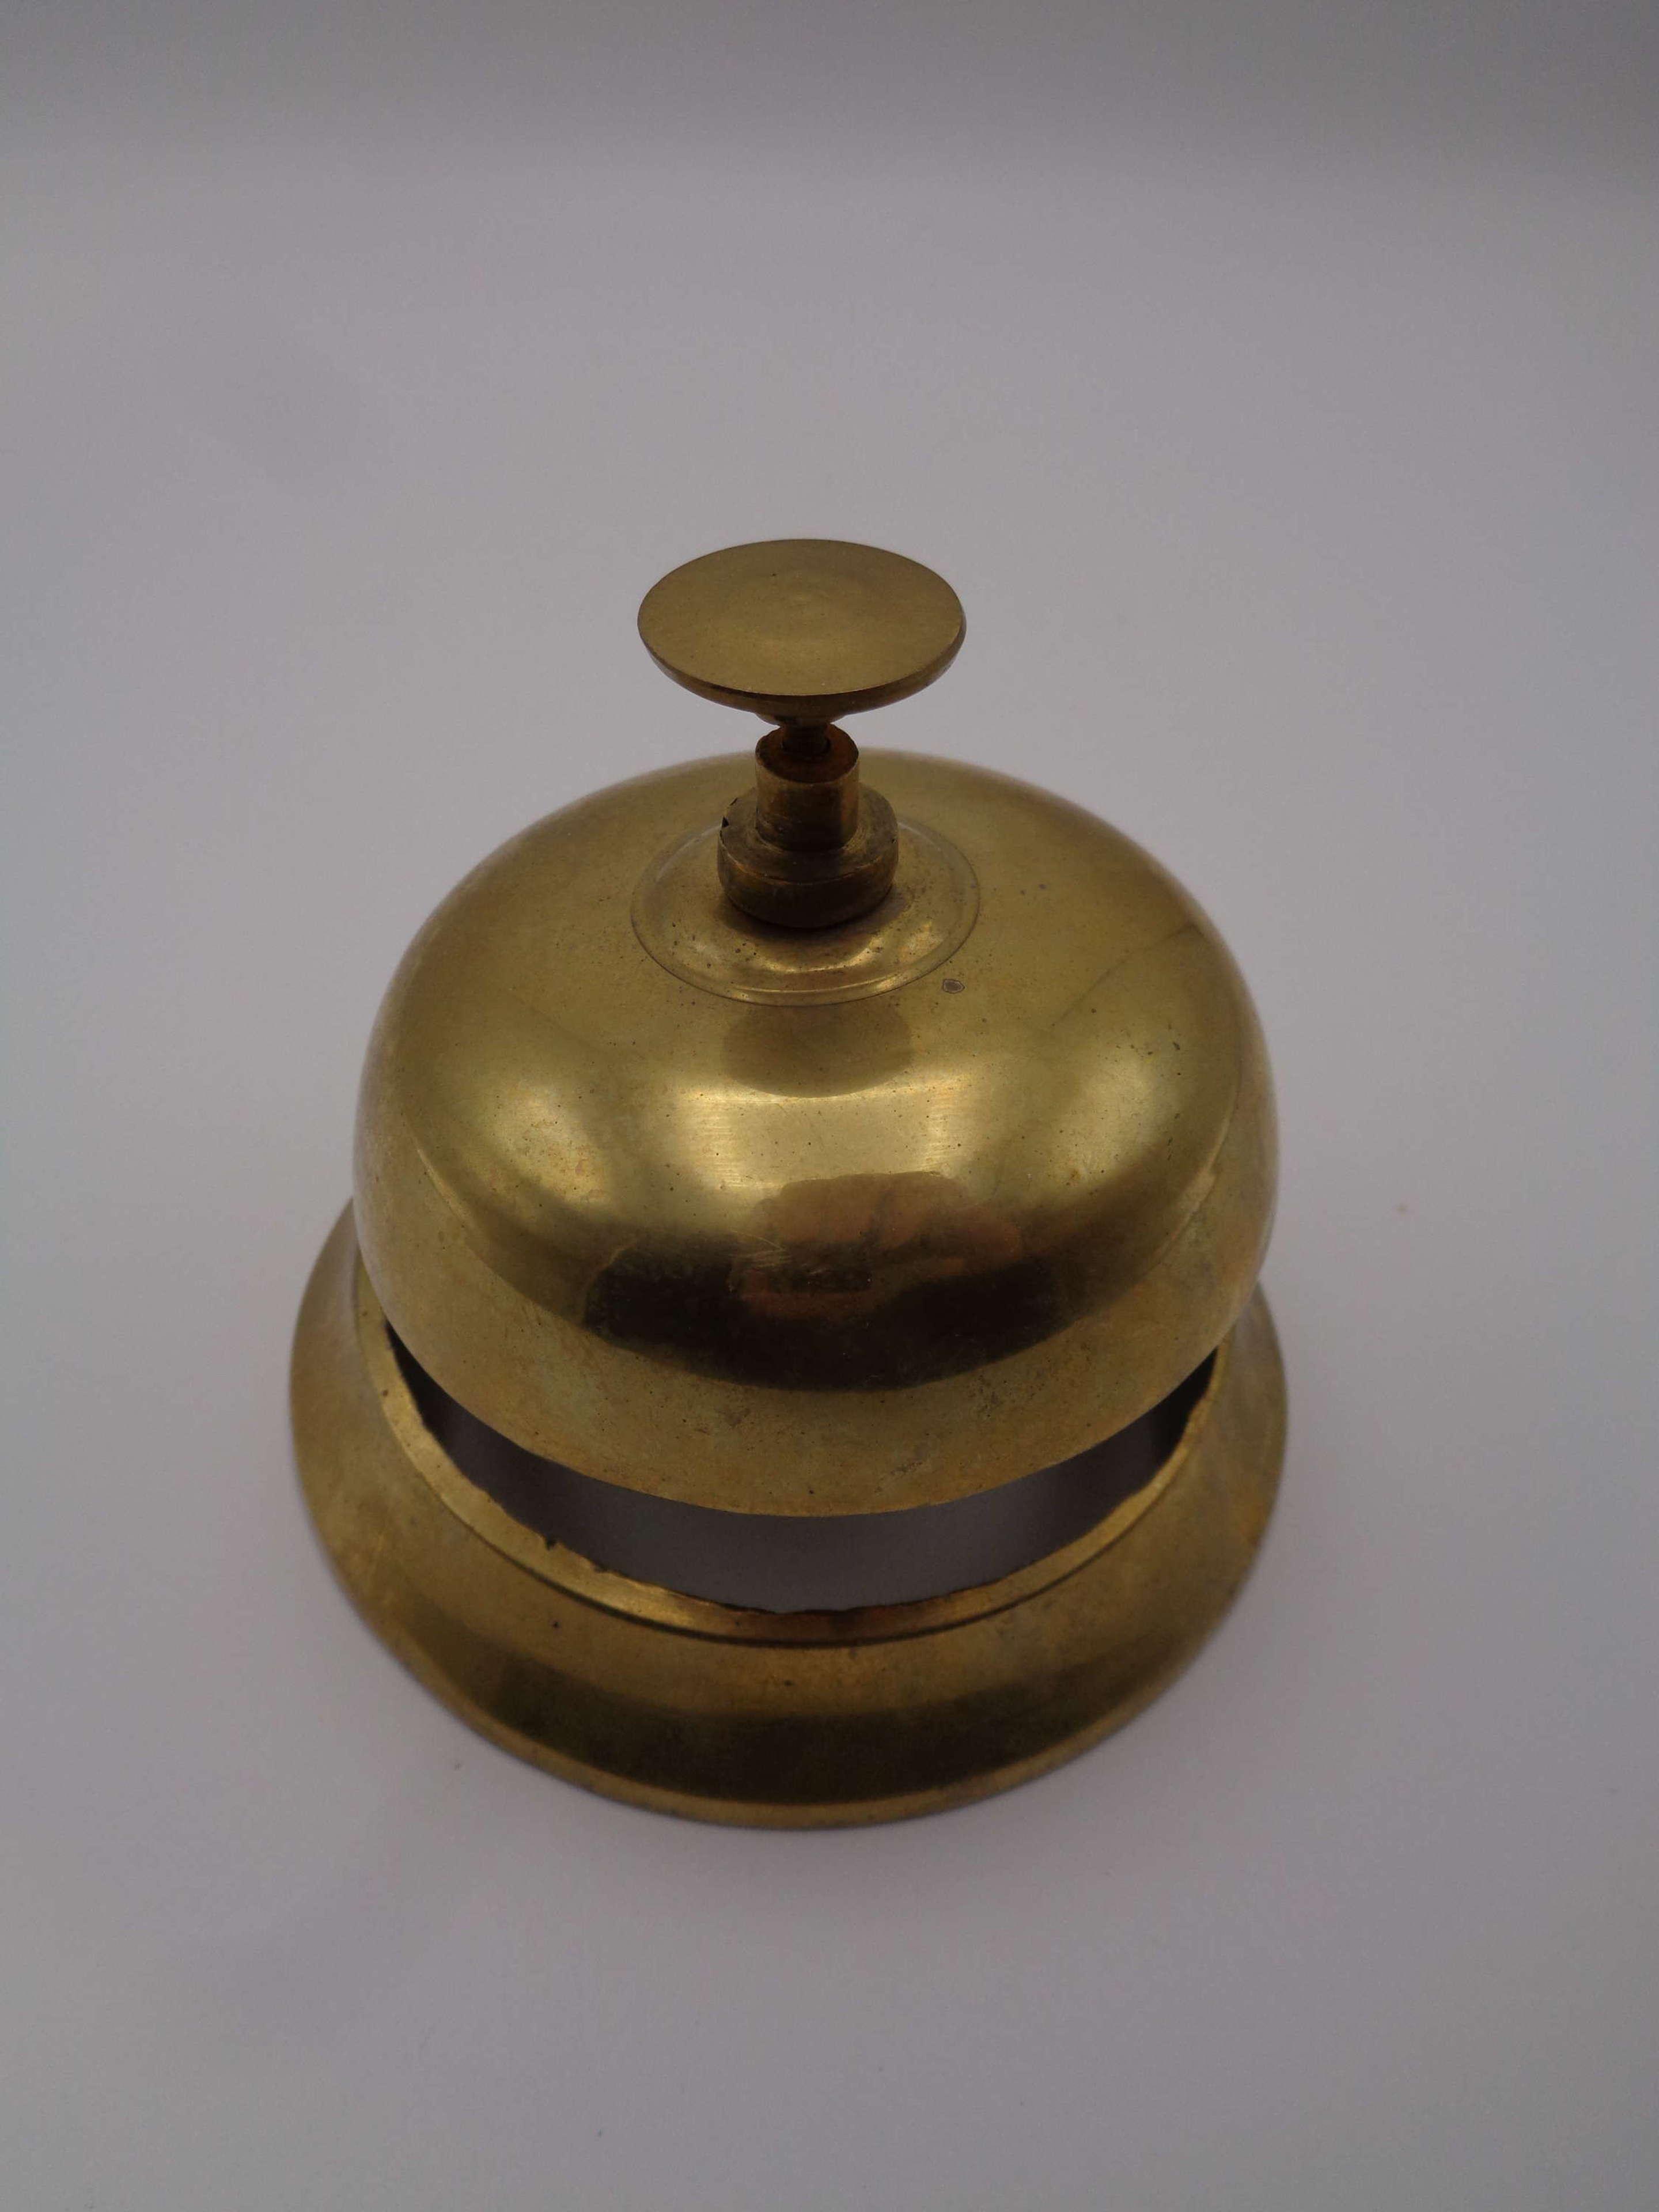 Vintage Brass Shop Counter Bell